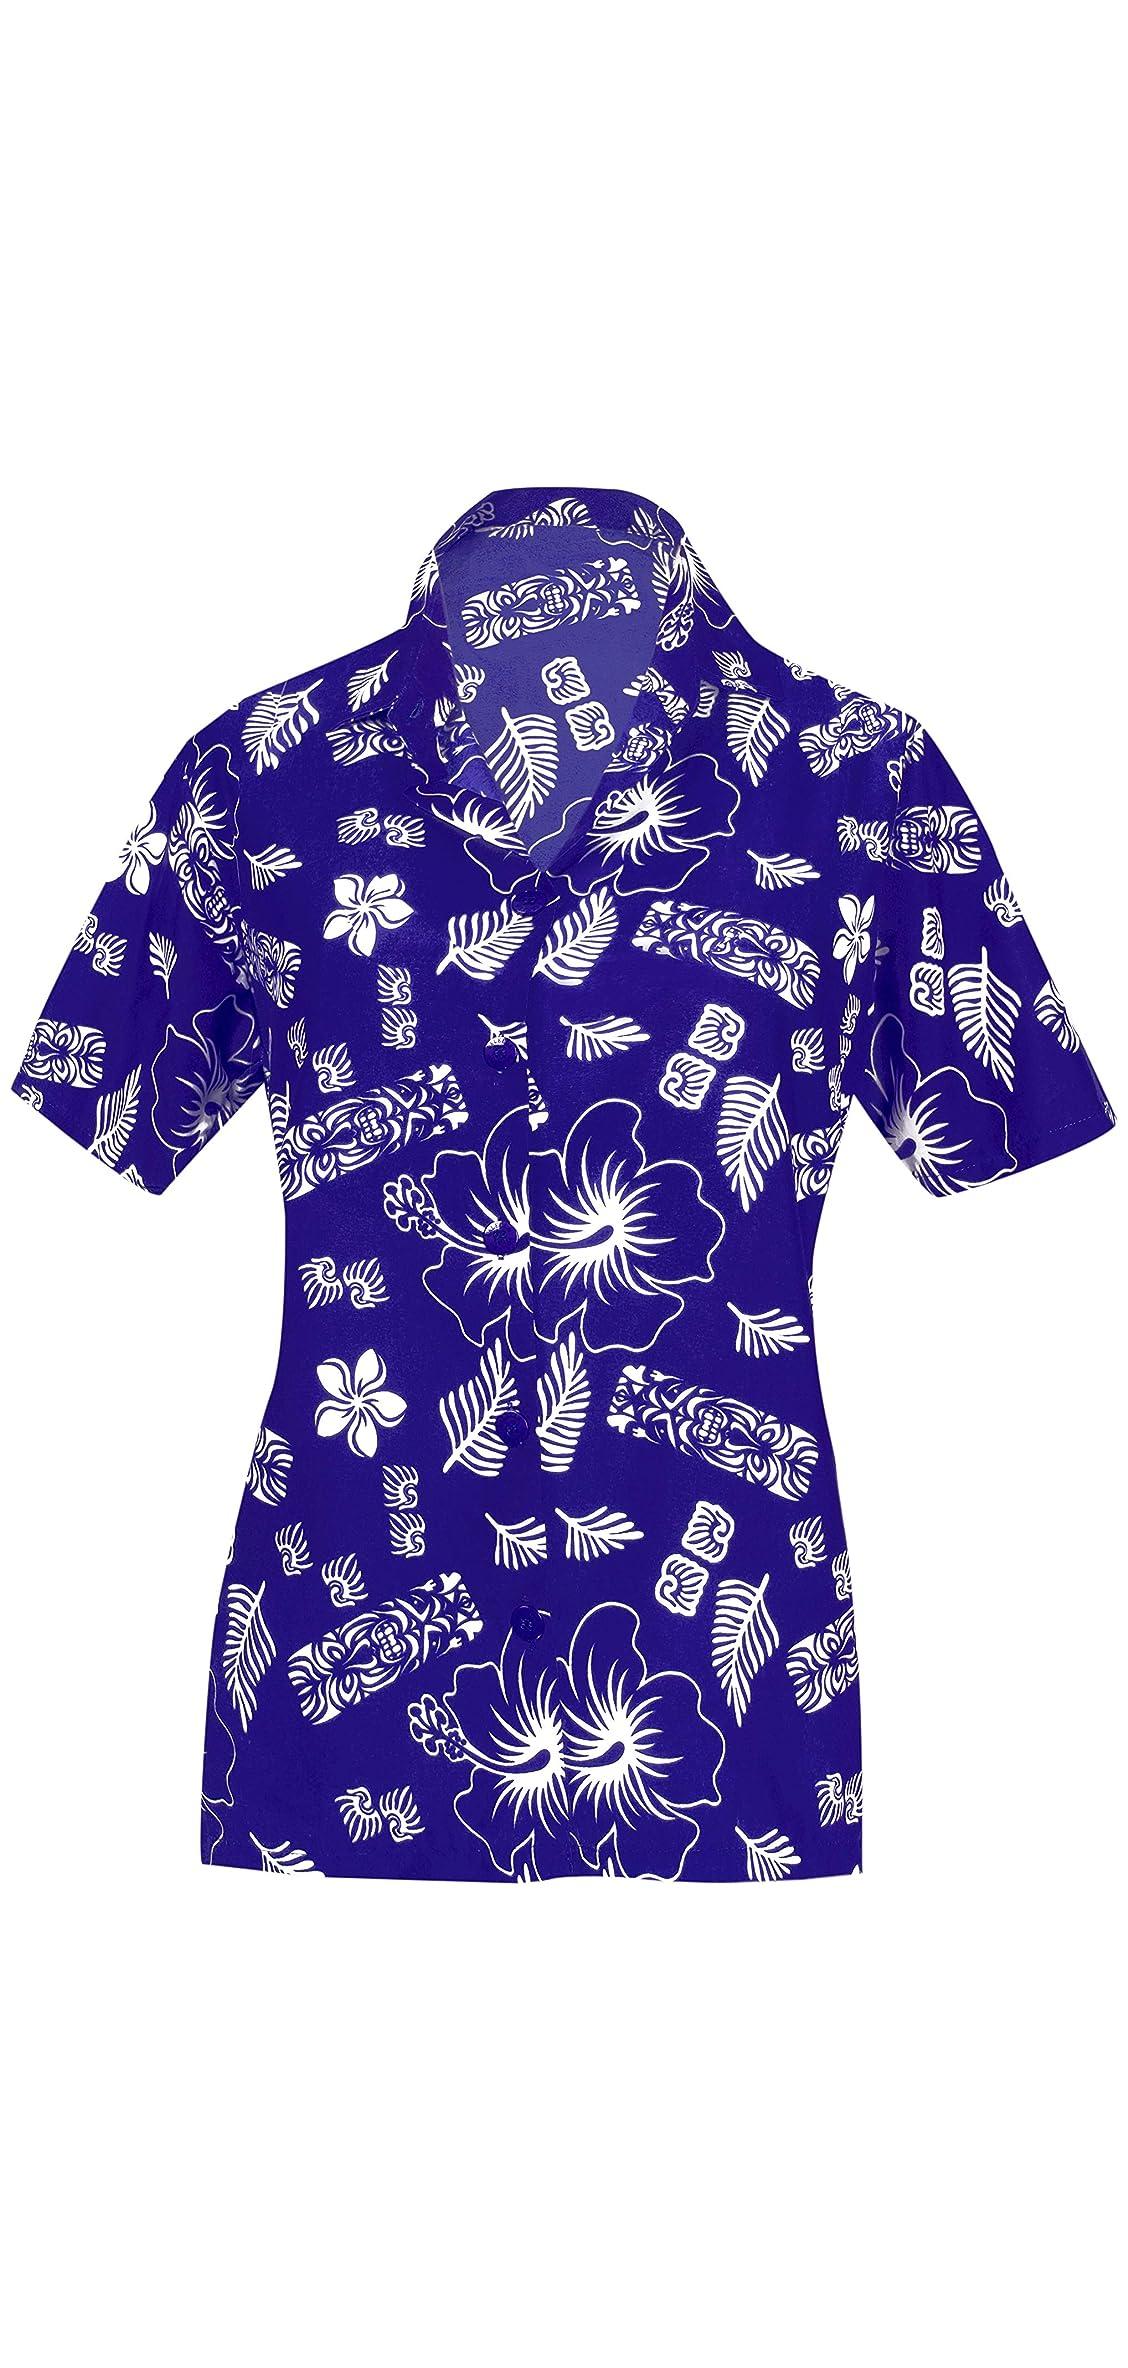 Women's Hawaiian Blouse Shirt Beach Aloha Party Casual